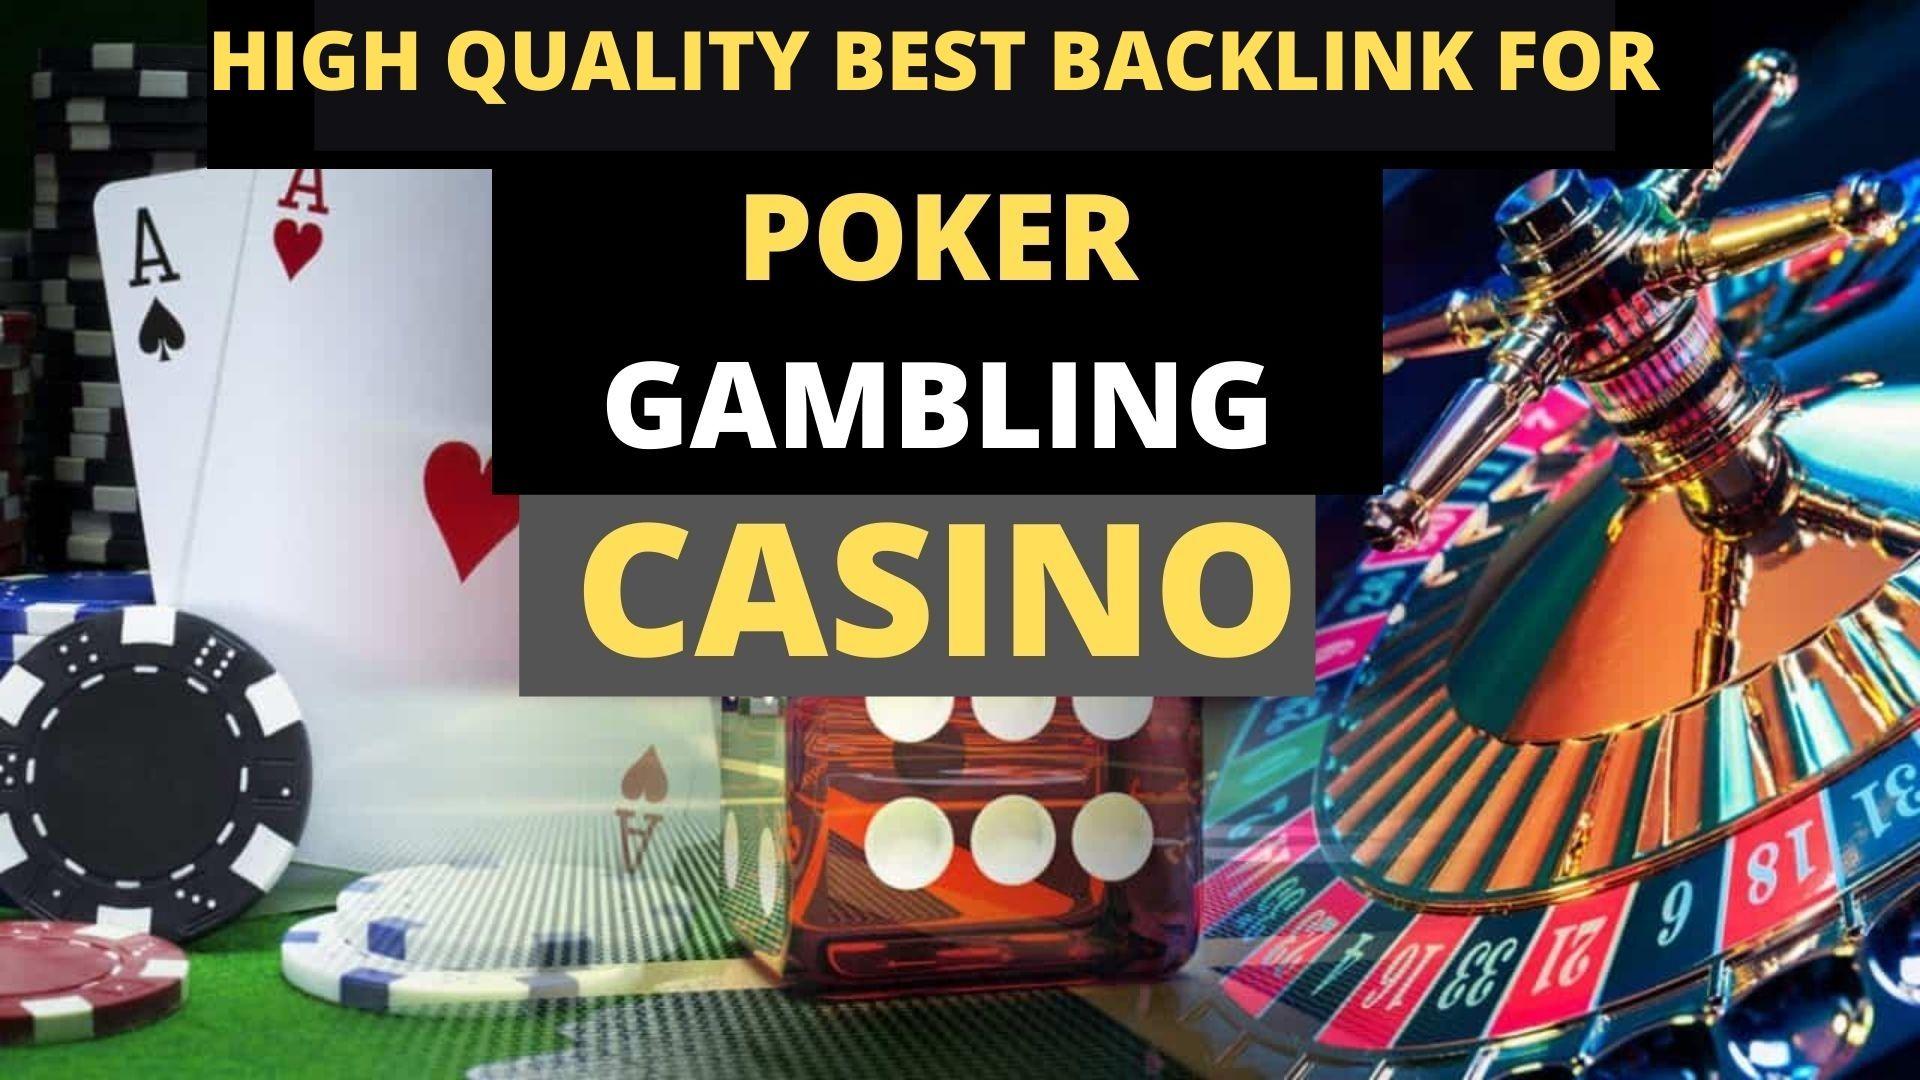 600 CASINO/POKER Gambling,  Judi Bola,  Google 1st Page Ranking & Relate PBN Backlink with BLOG POST